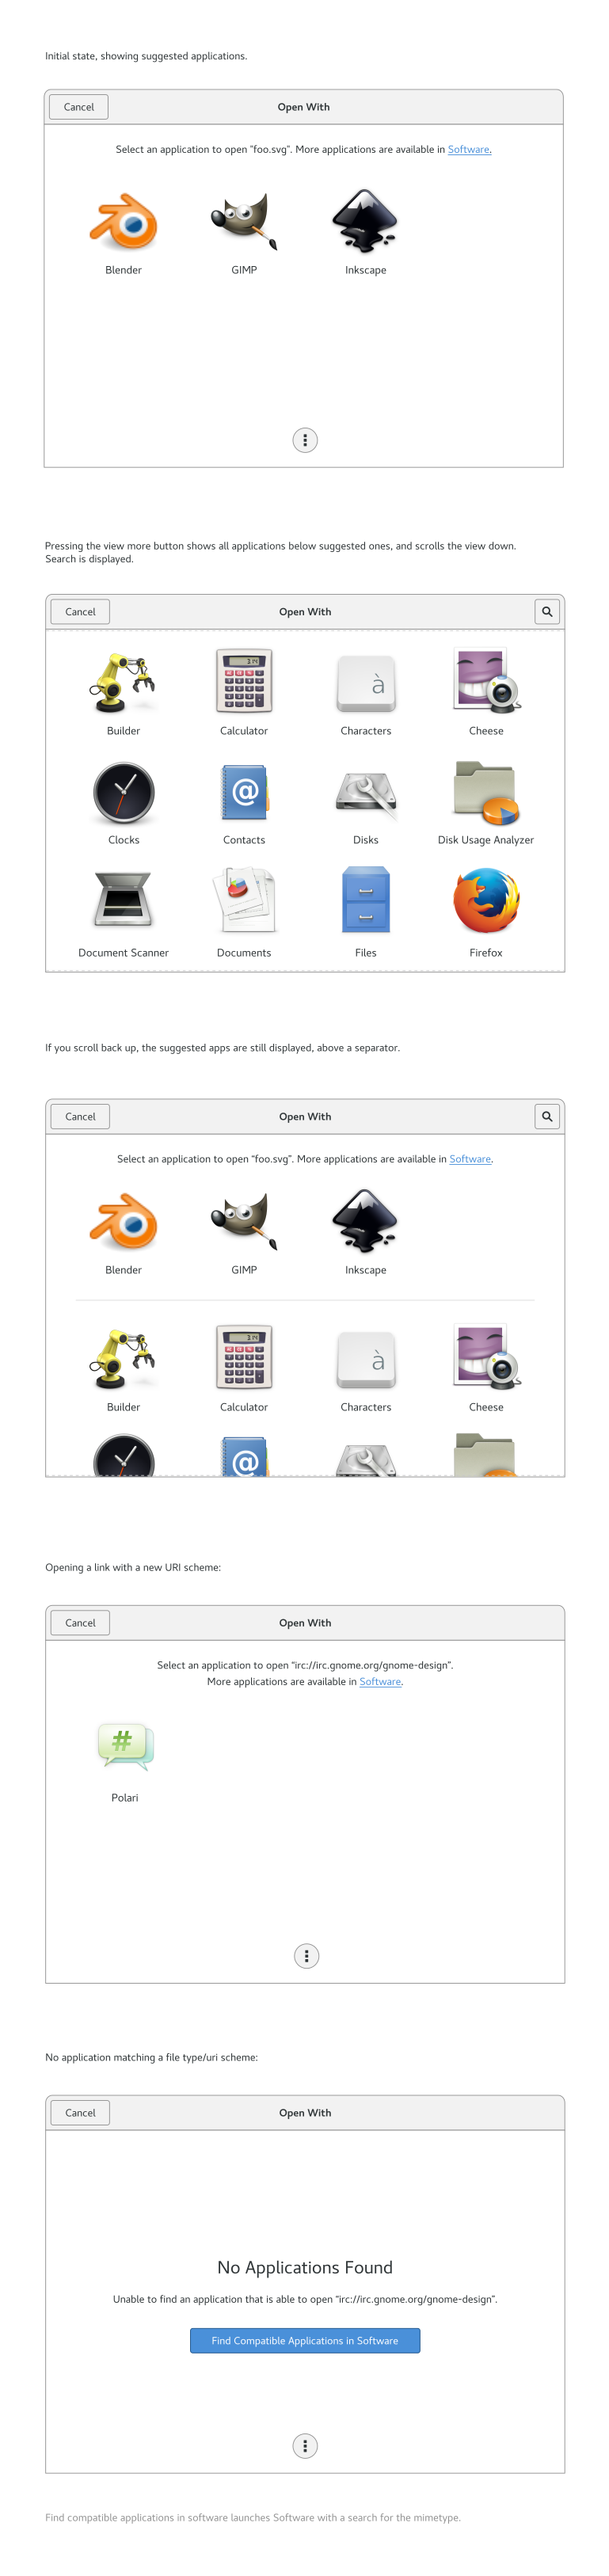 https://raw.githubusercontent.com/gnome-design-team/gnome-mockups/master/portals/app-selector.png